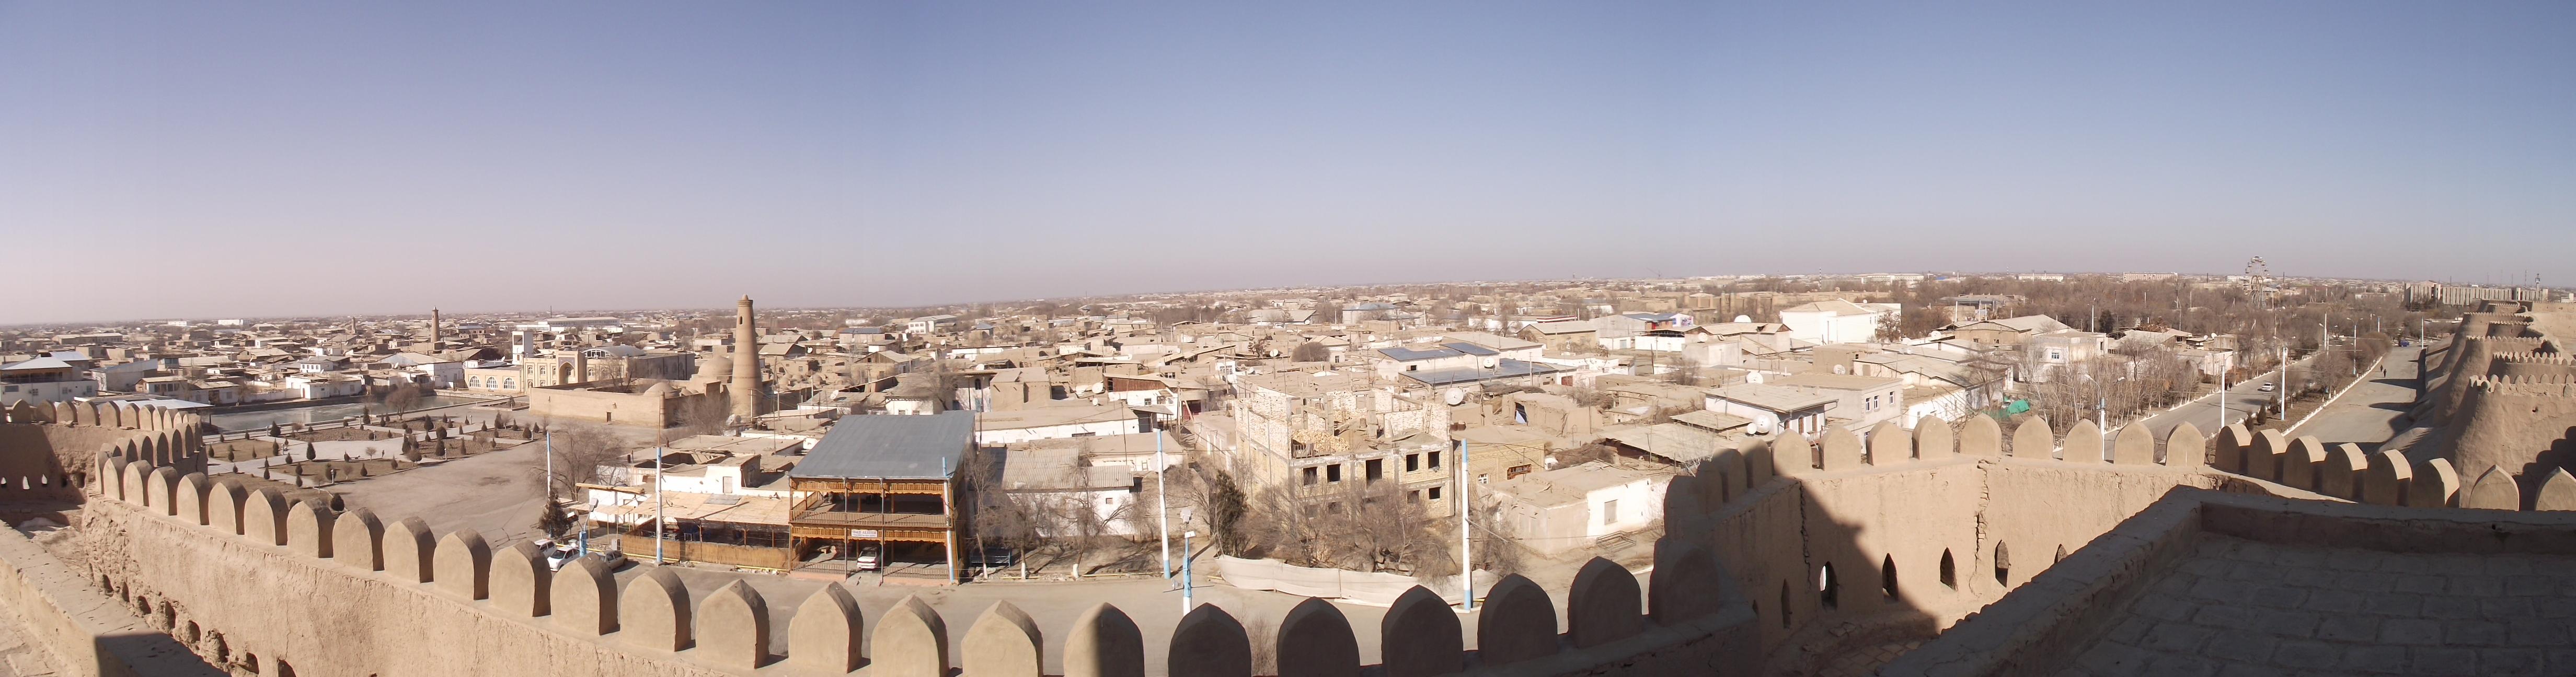 Description khiva узбекистан panorama2 jpg